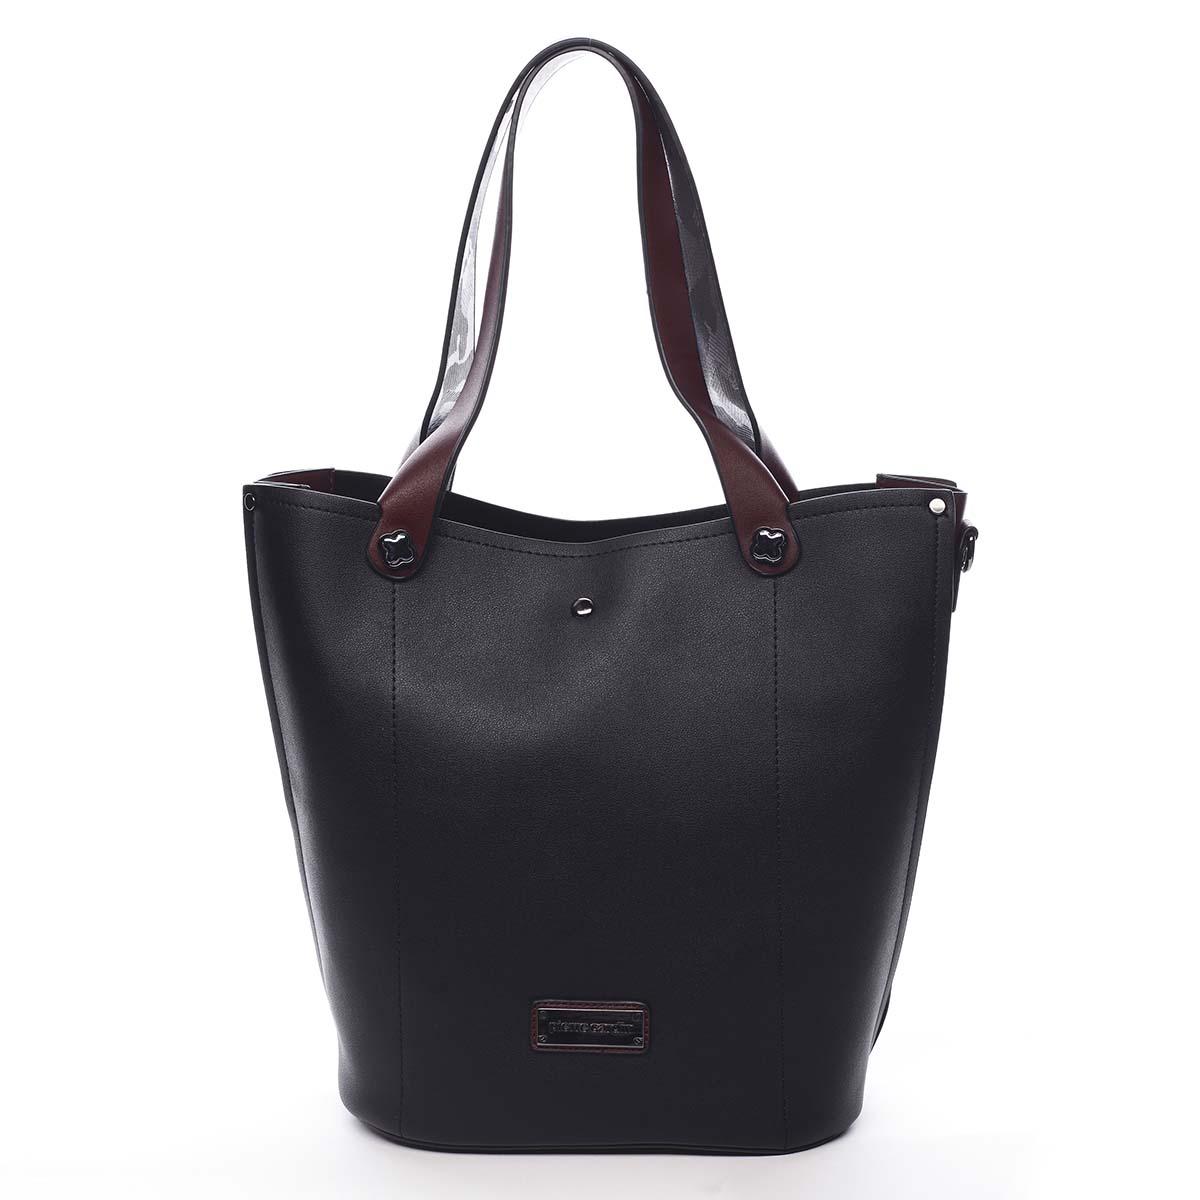 Dámska kabelka čierna - Pierre Cardin Avrill čierna